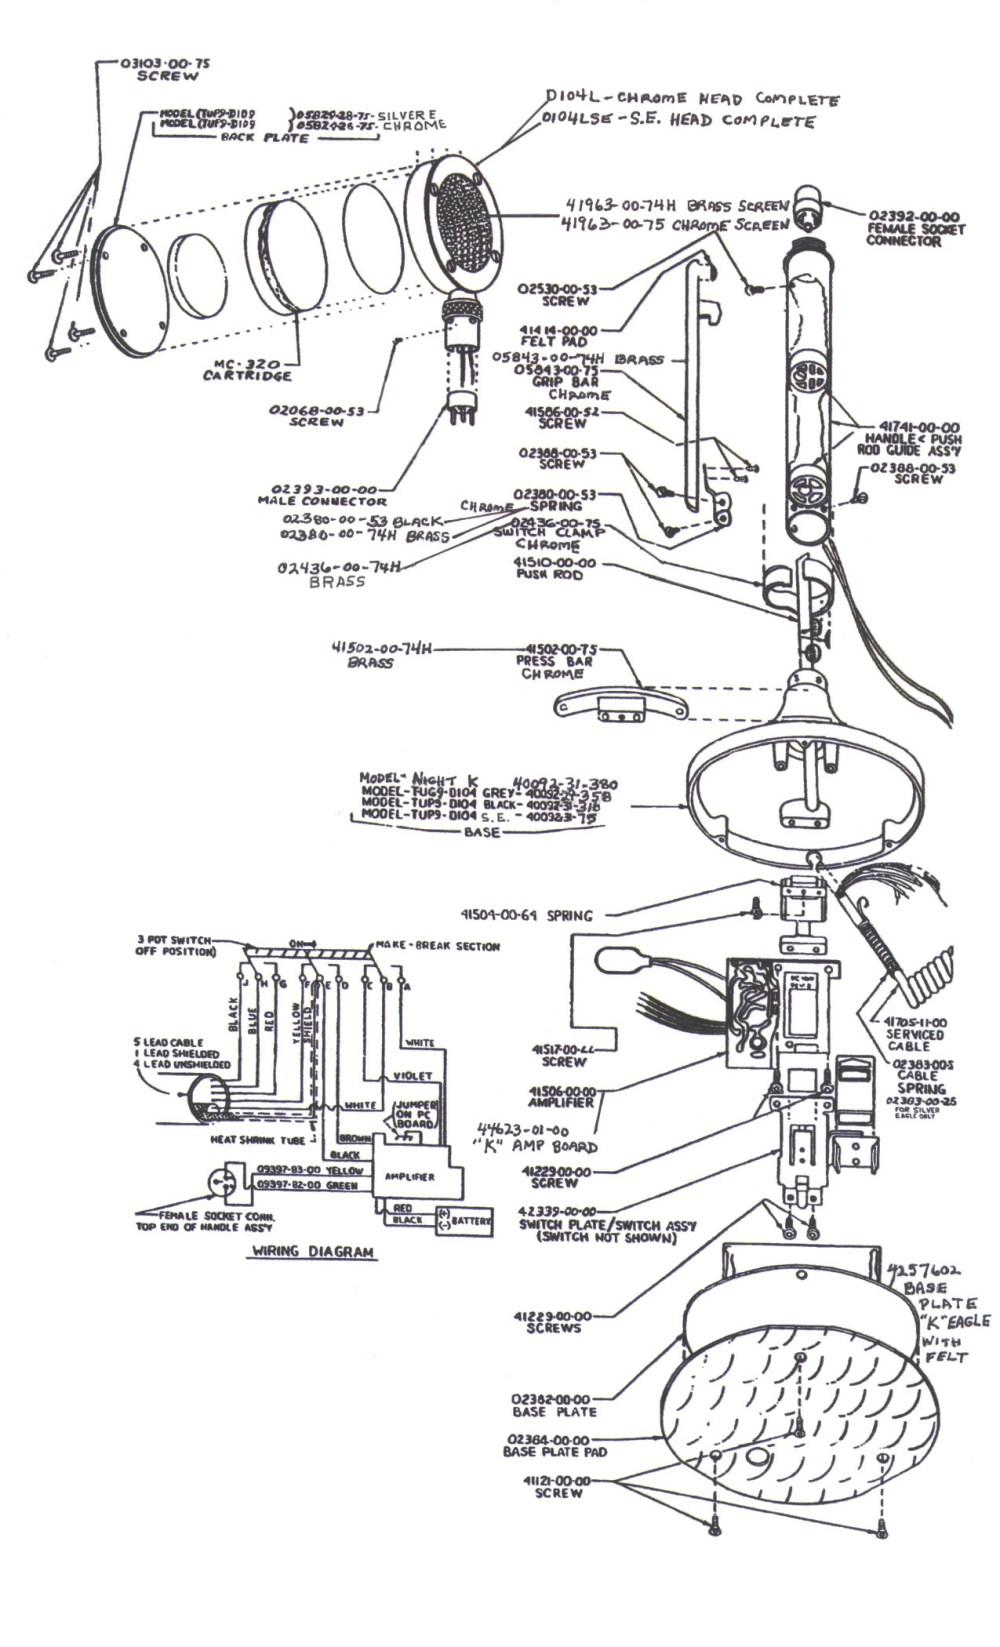 medium resolution of partsforbasemic rh rrcom com astatic 636l mic wiring astatic d 104 switch e r